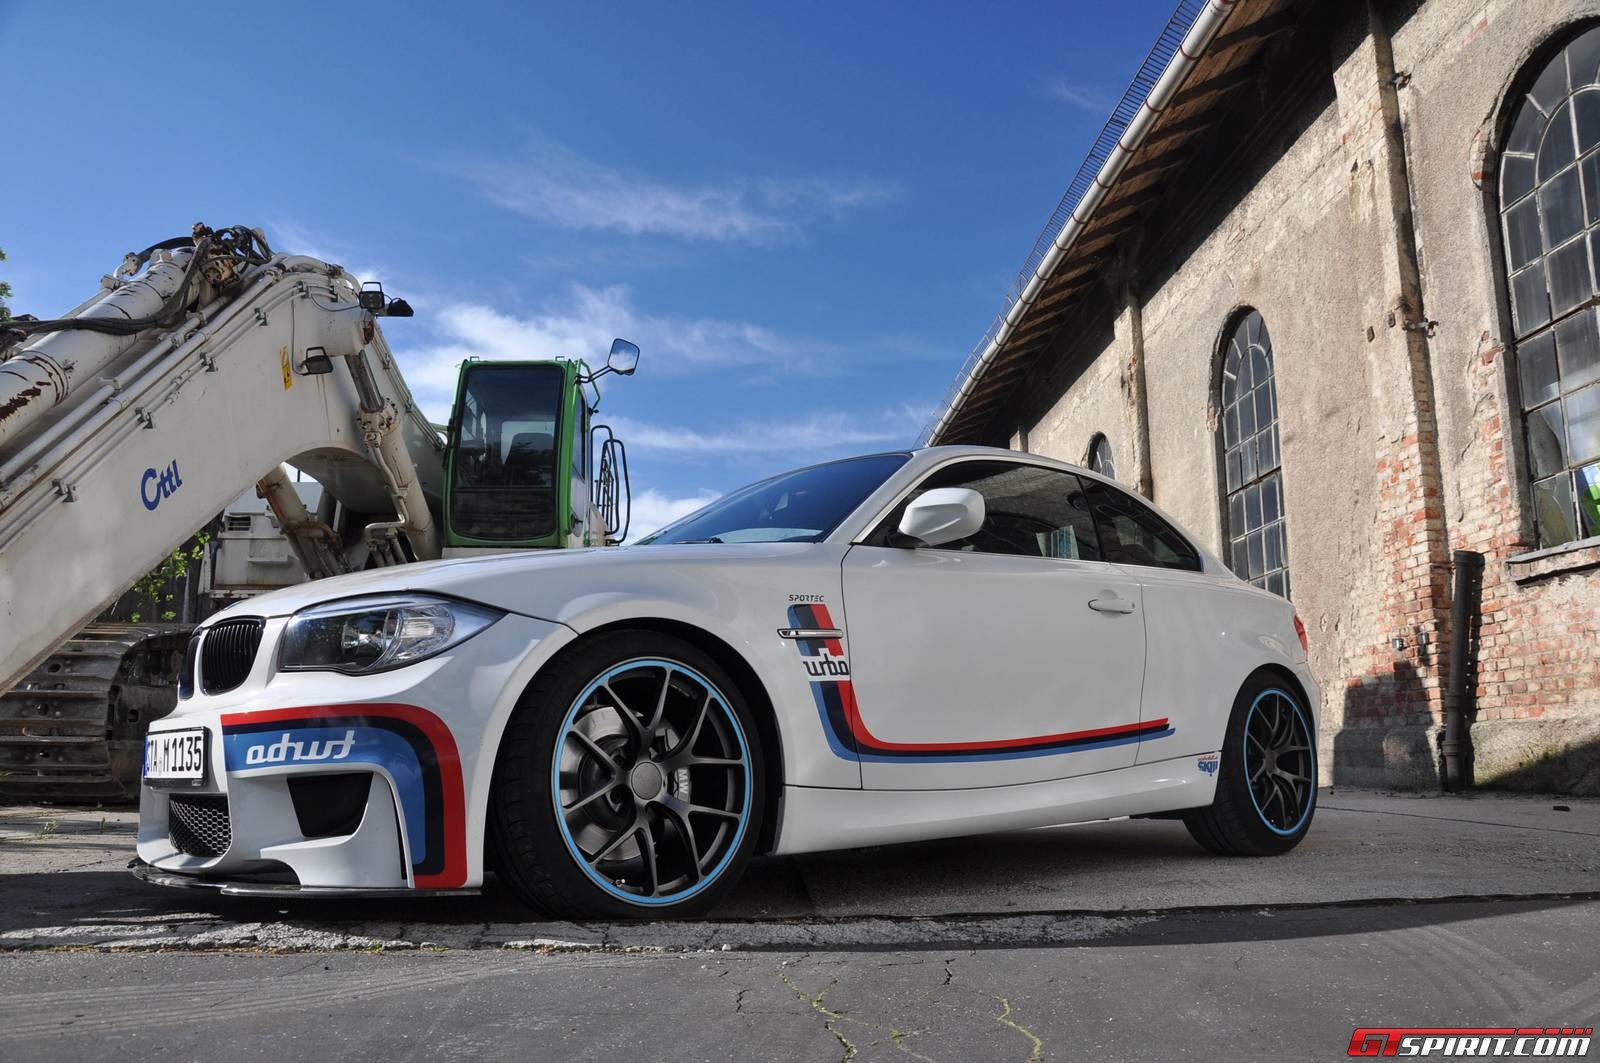 Official Sportec BMW Series M Coupé GTspirit - Bmw 1 series m coupe